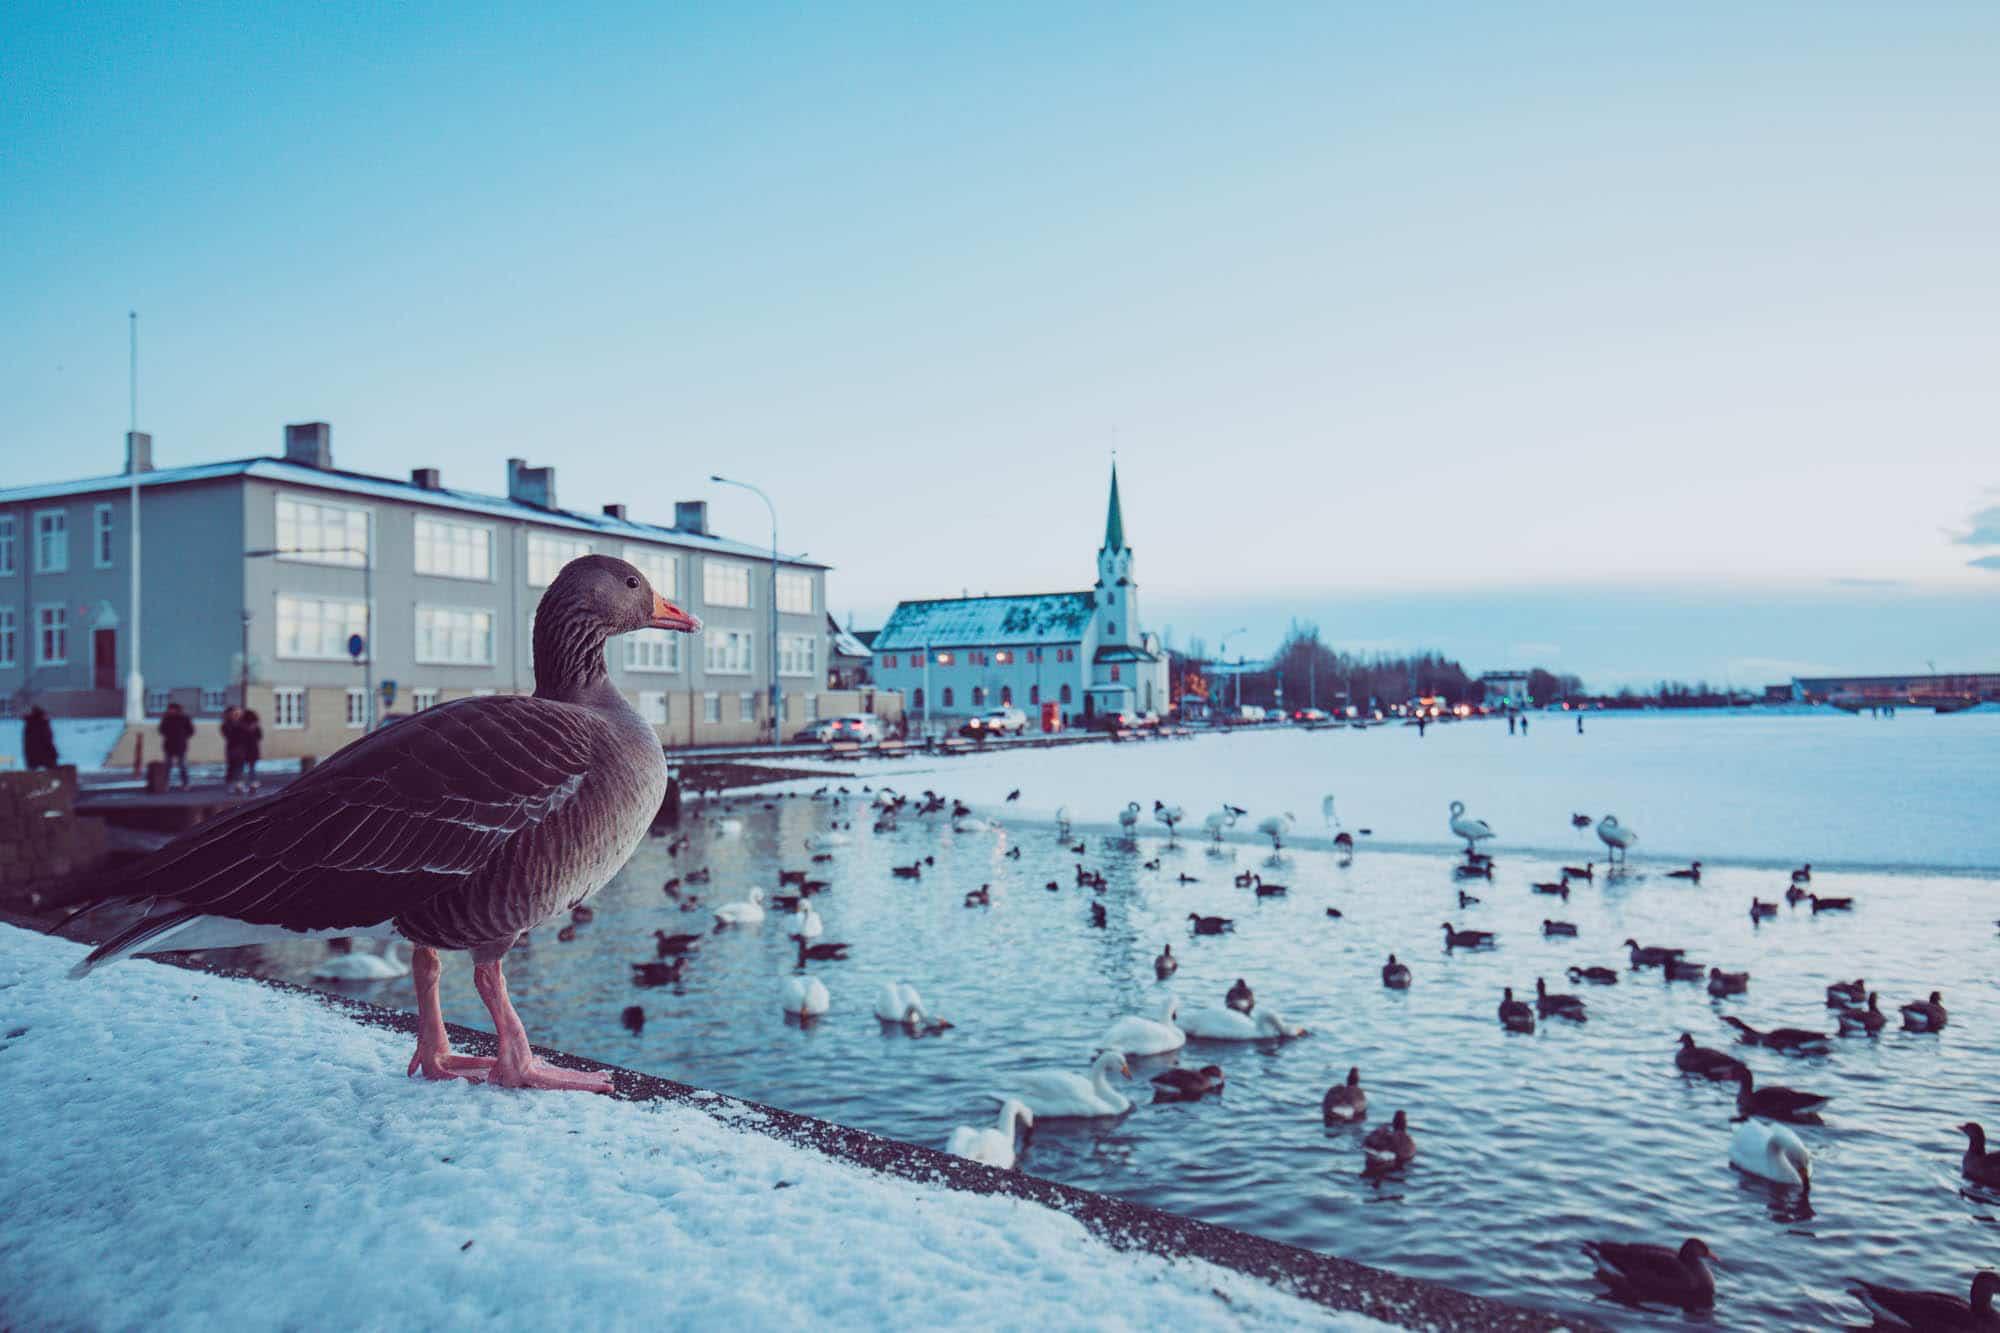 Ducks at the Reykjavík pond - Tjörnin - Iceland with kids